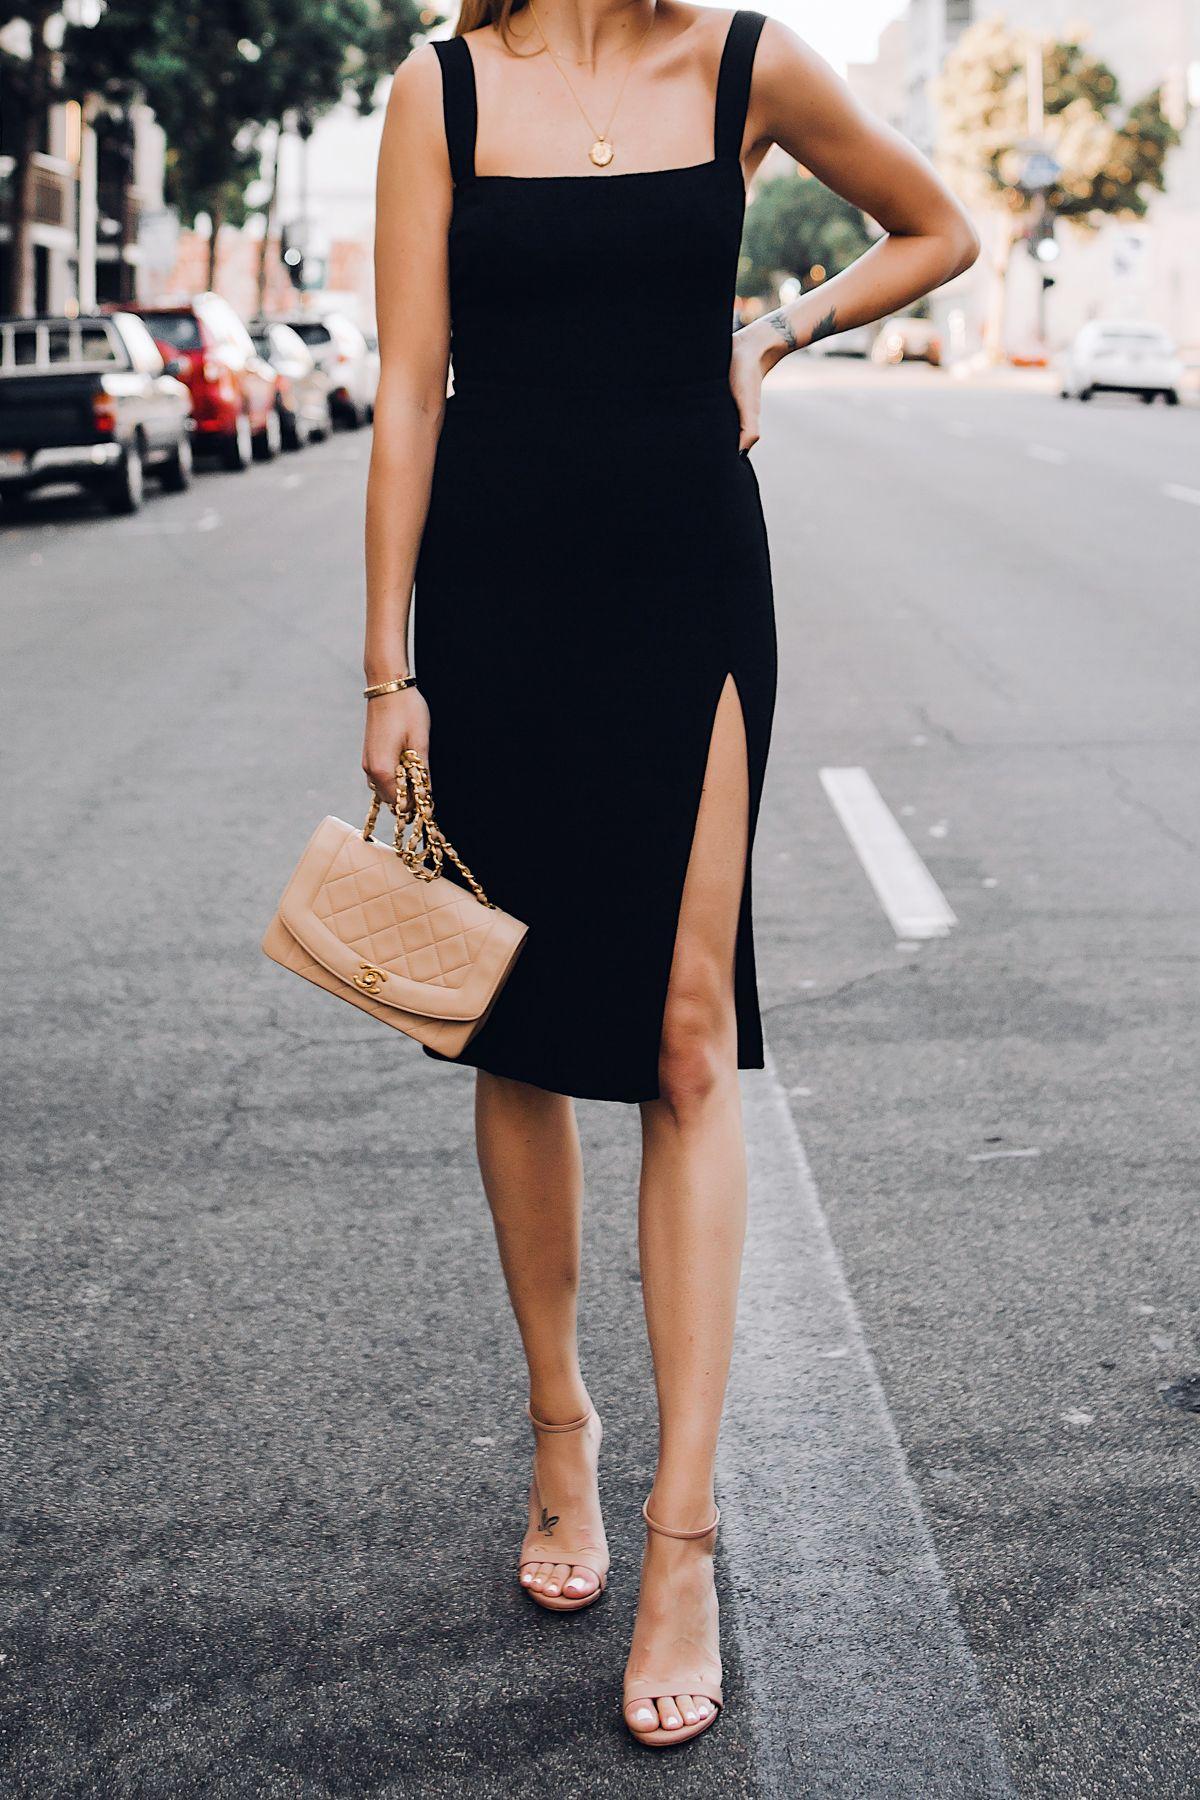 421fa6663f92 Woman Wearing Reformation Black Dress Tan Ankle Strap Heeled Sandals Chanel  Tan Diana Handbag Gold Coin Necklace Fashion Jackson San Diego Fashion  Blogger ...